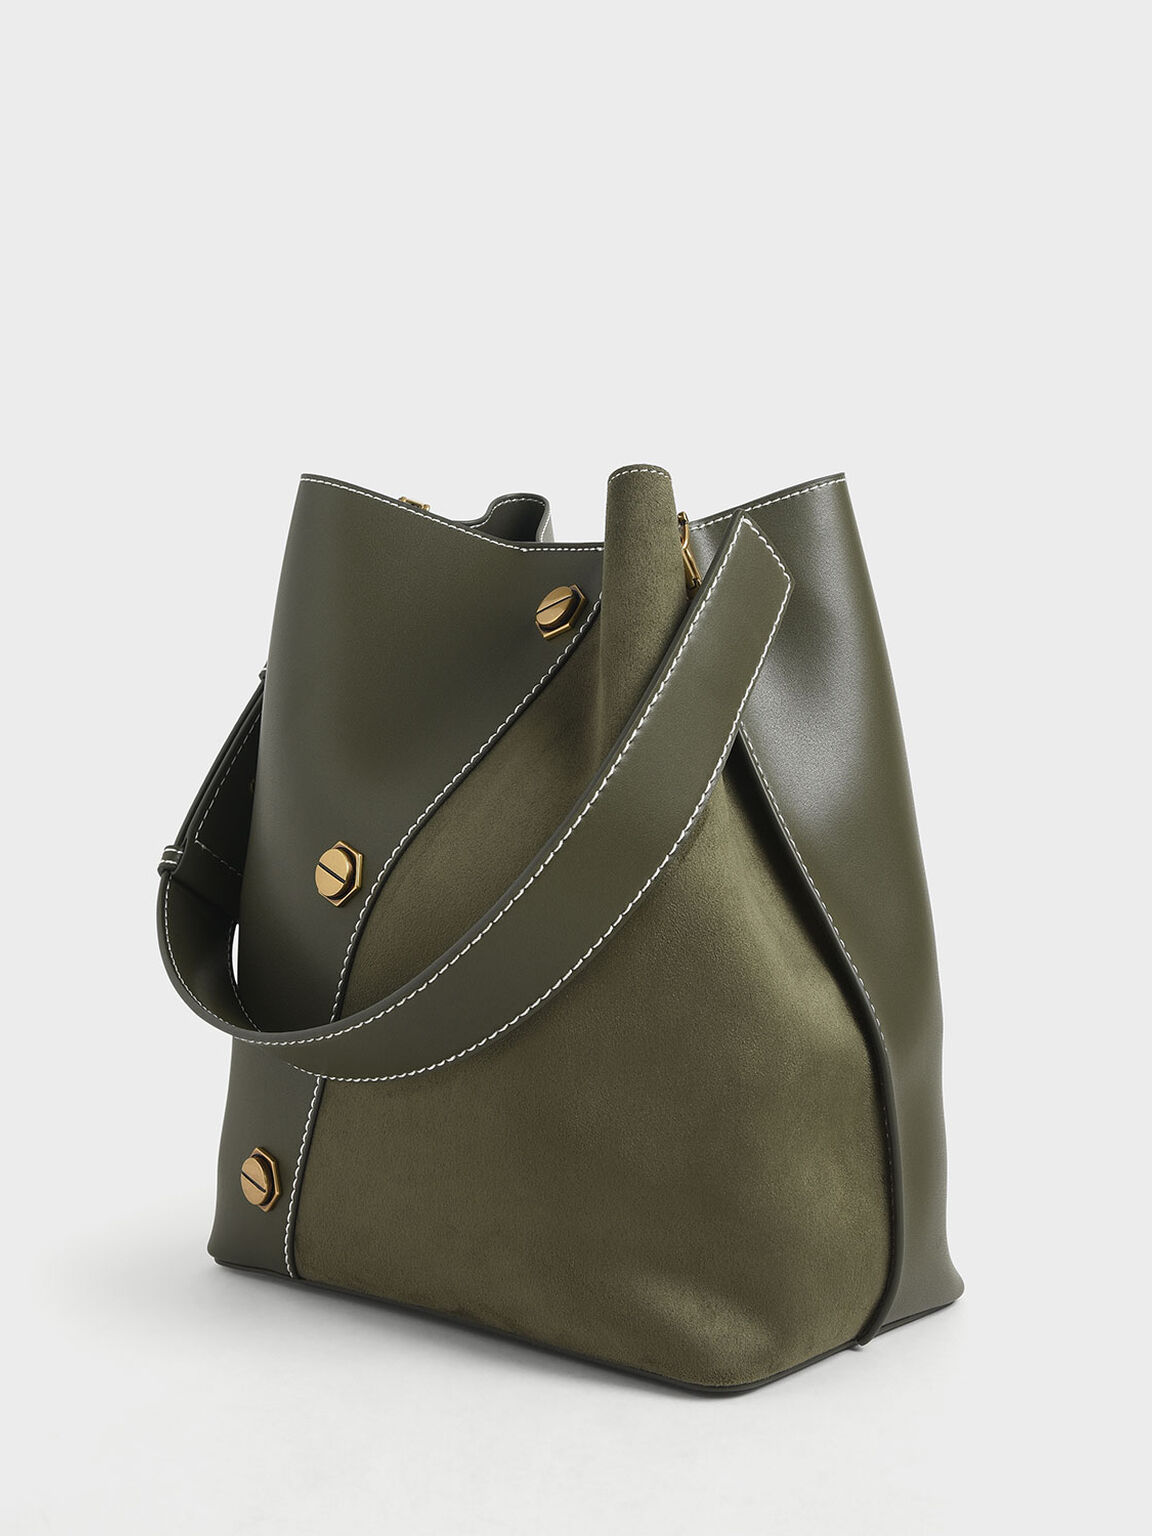 金屬鉚釘Hobo包, 橄欖色, hi-res